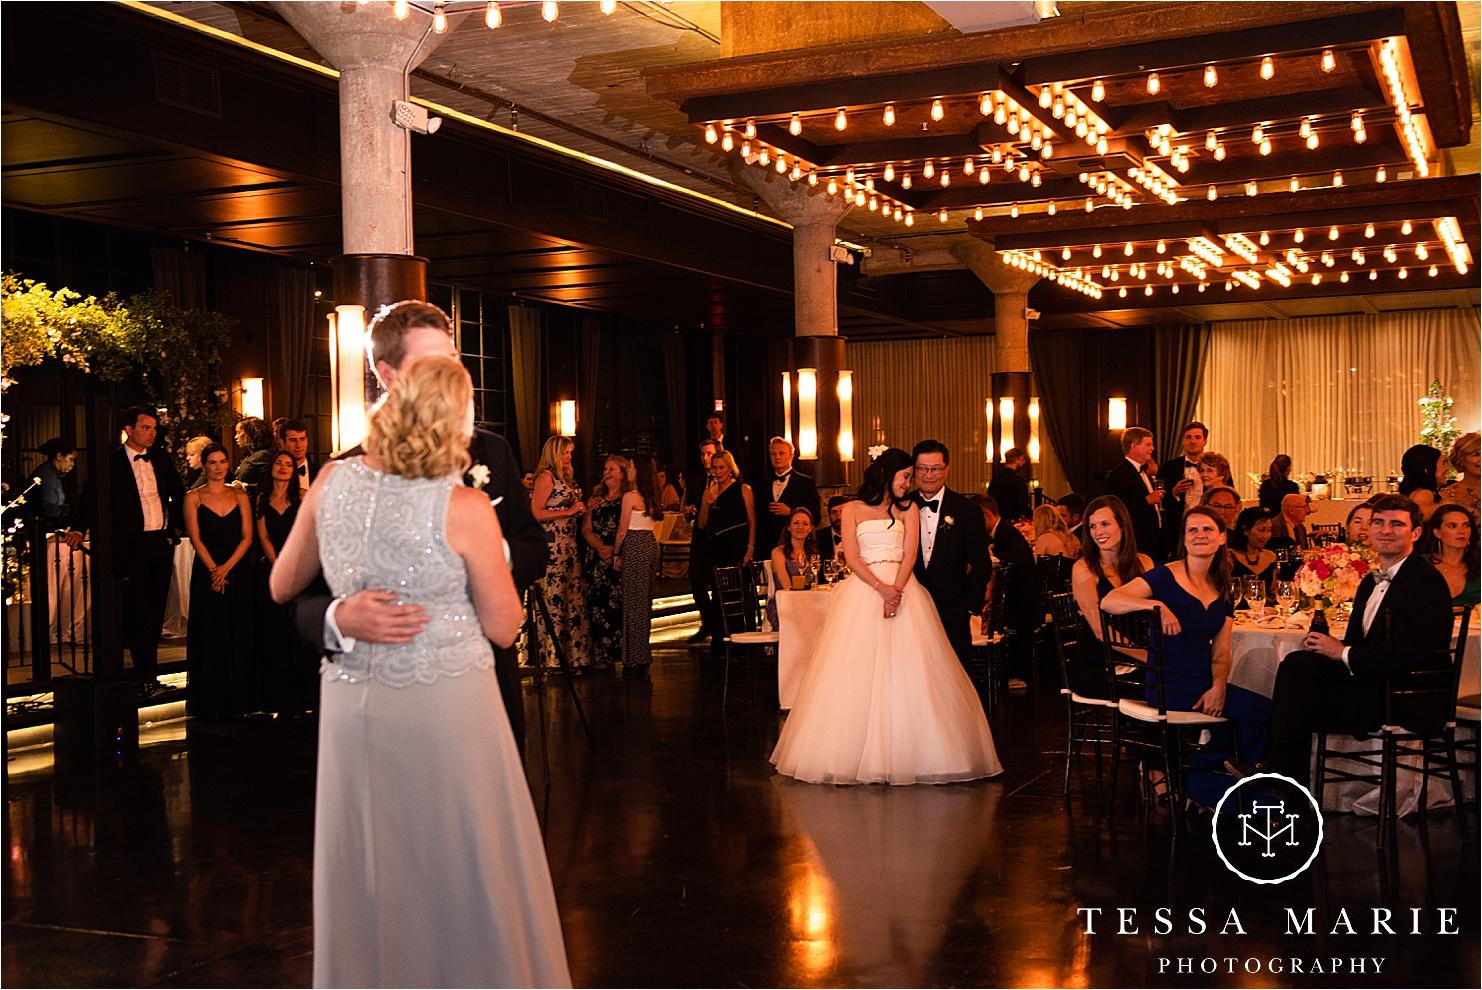 Tessa_marie_weddings_houston_wedding_photographer_The_astorian_0170.jpg